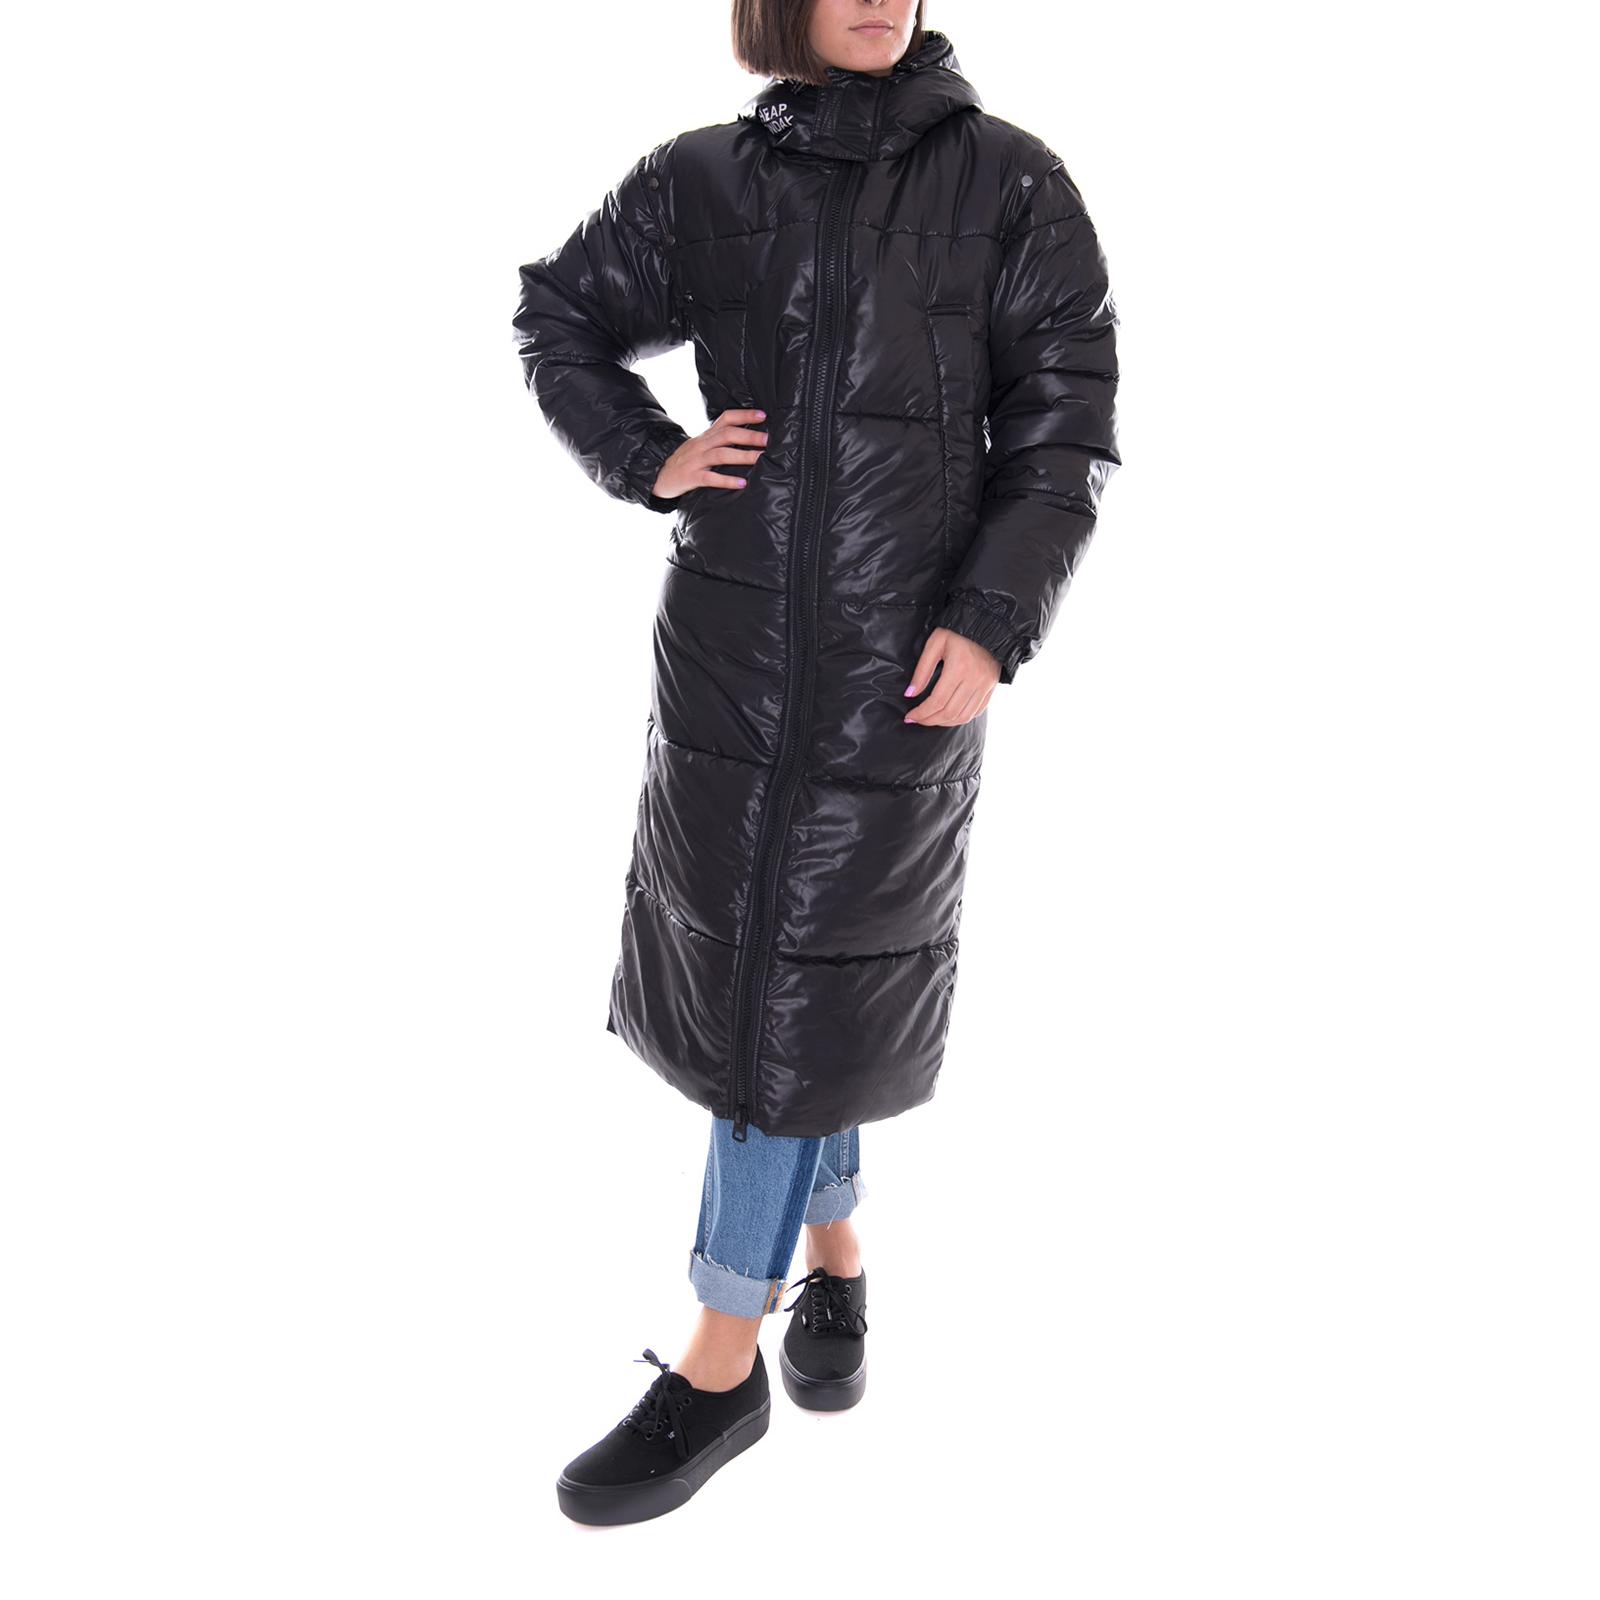 Ebay Black Giacche Monday Sender Nero Coat Cheap Sleeping 0w50q